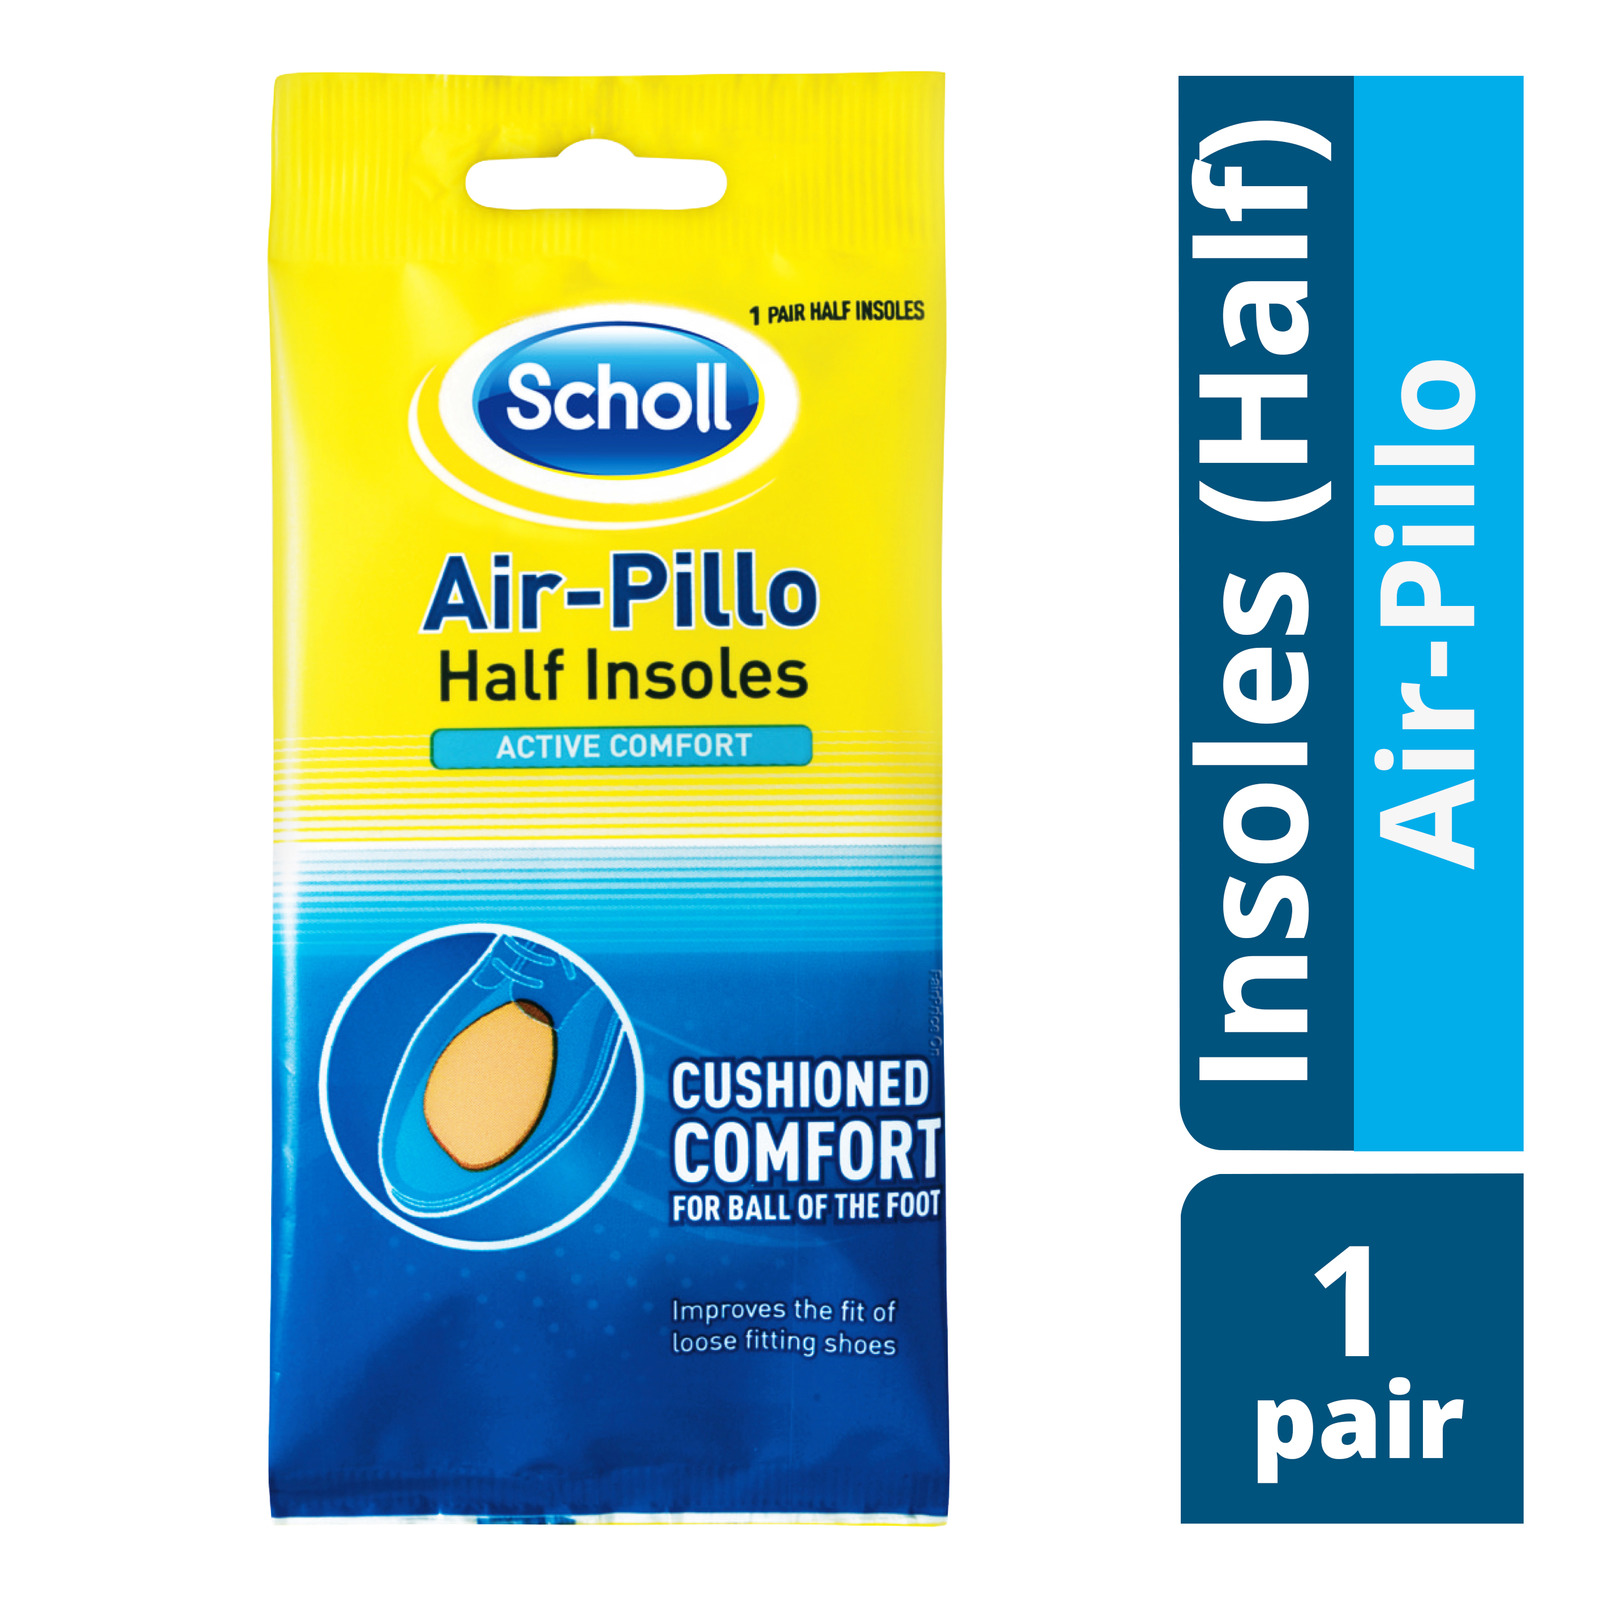 Scholl Half Insoles - Air-Pillo